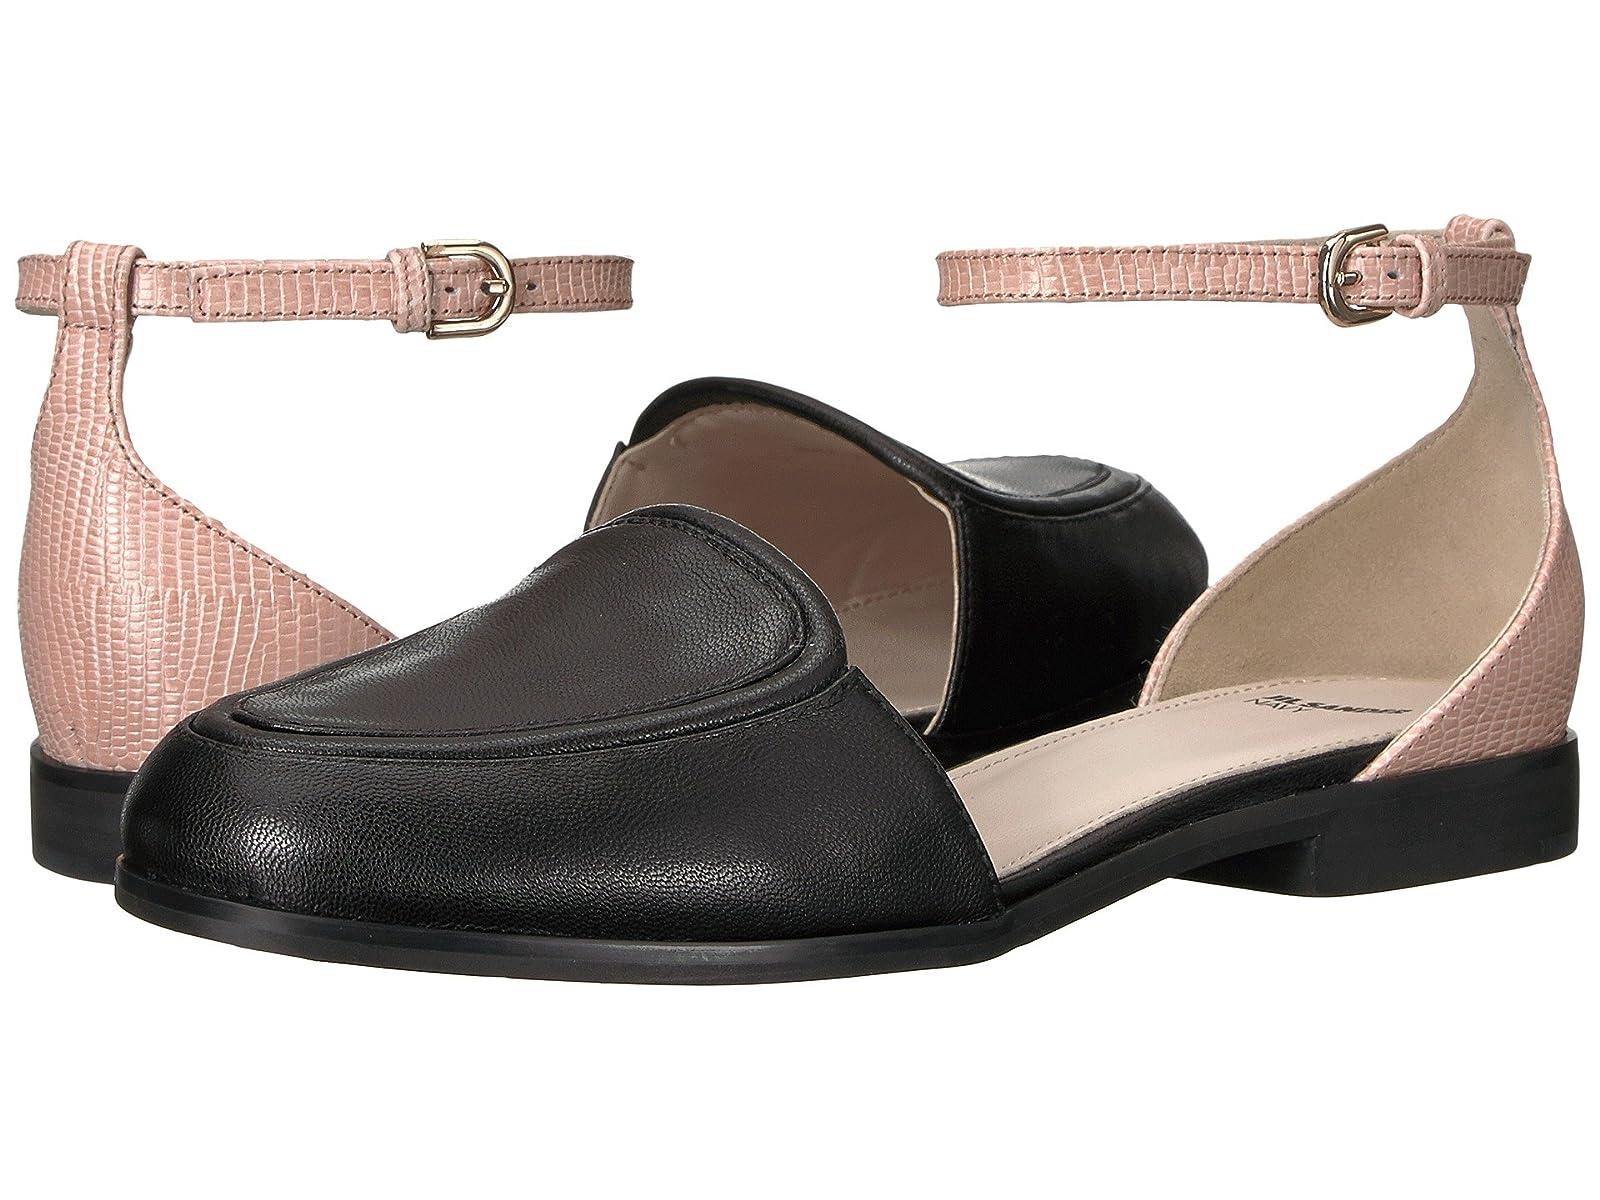 Jil Sander Navy JN28023Cheap and distinctive eye-catching shoes